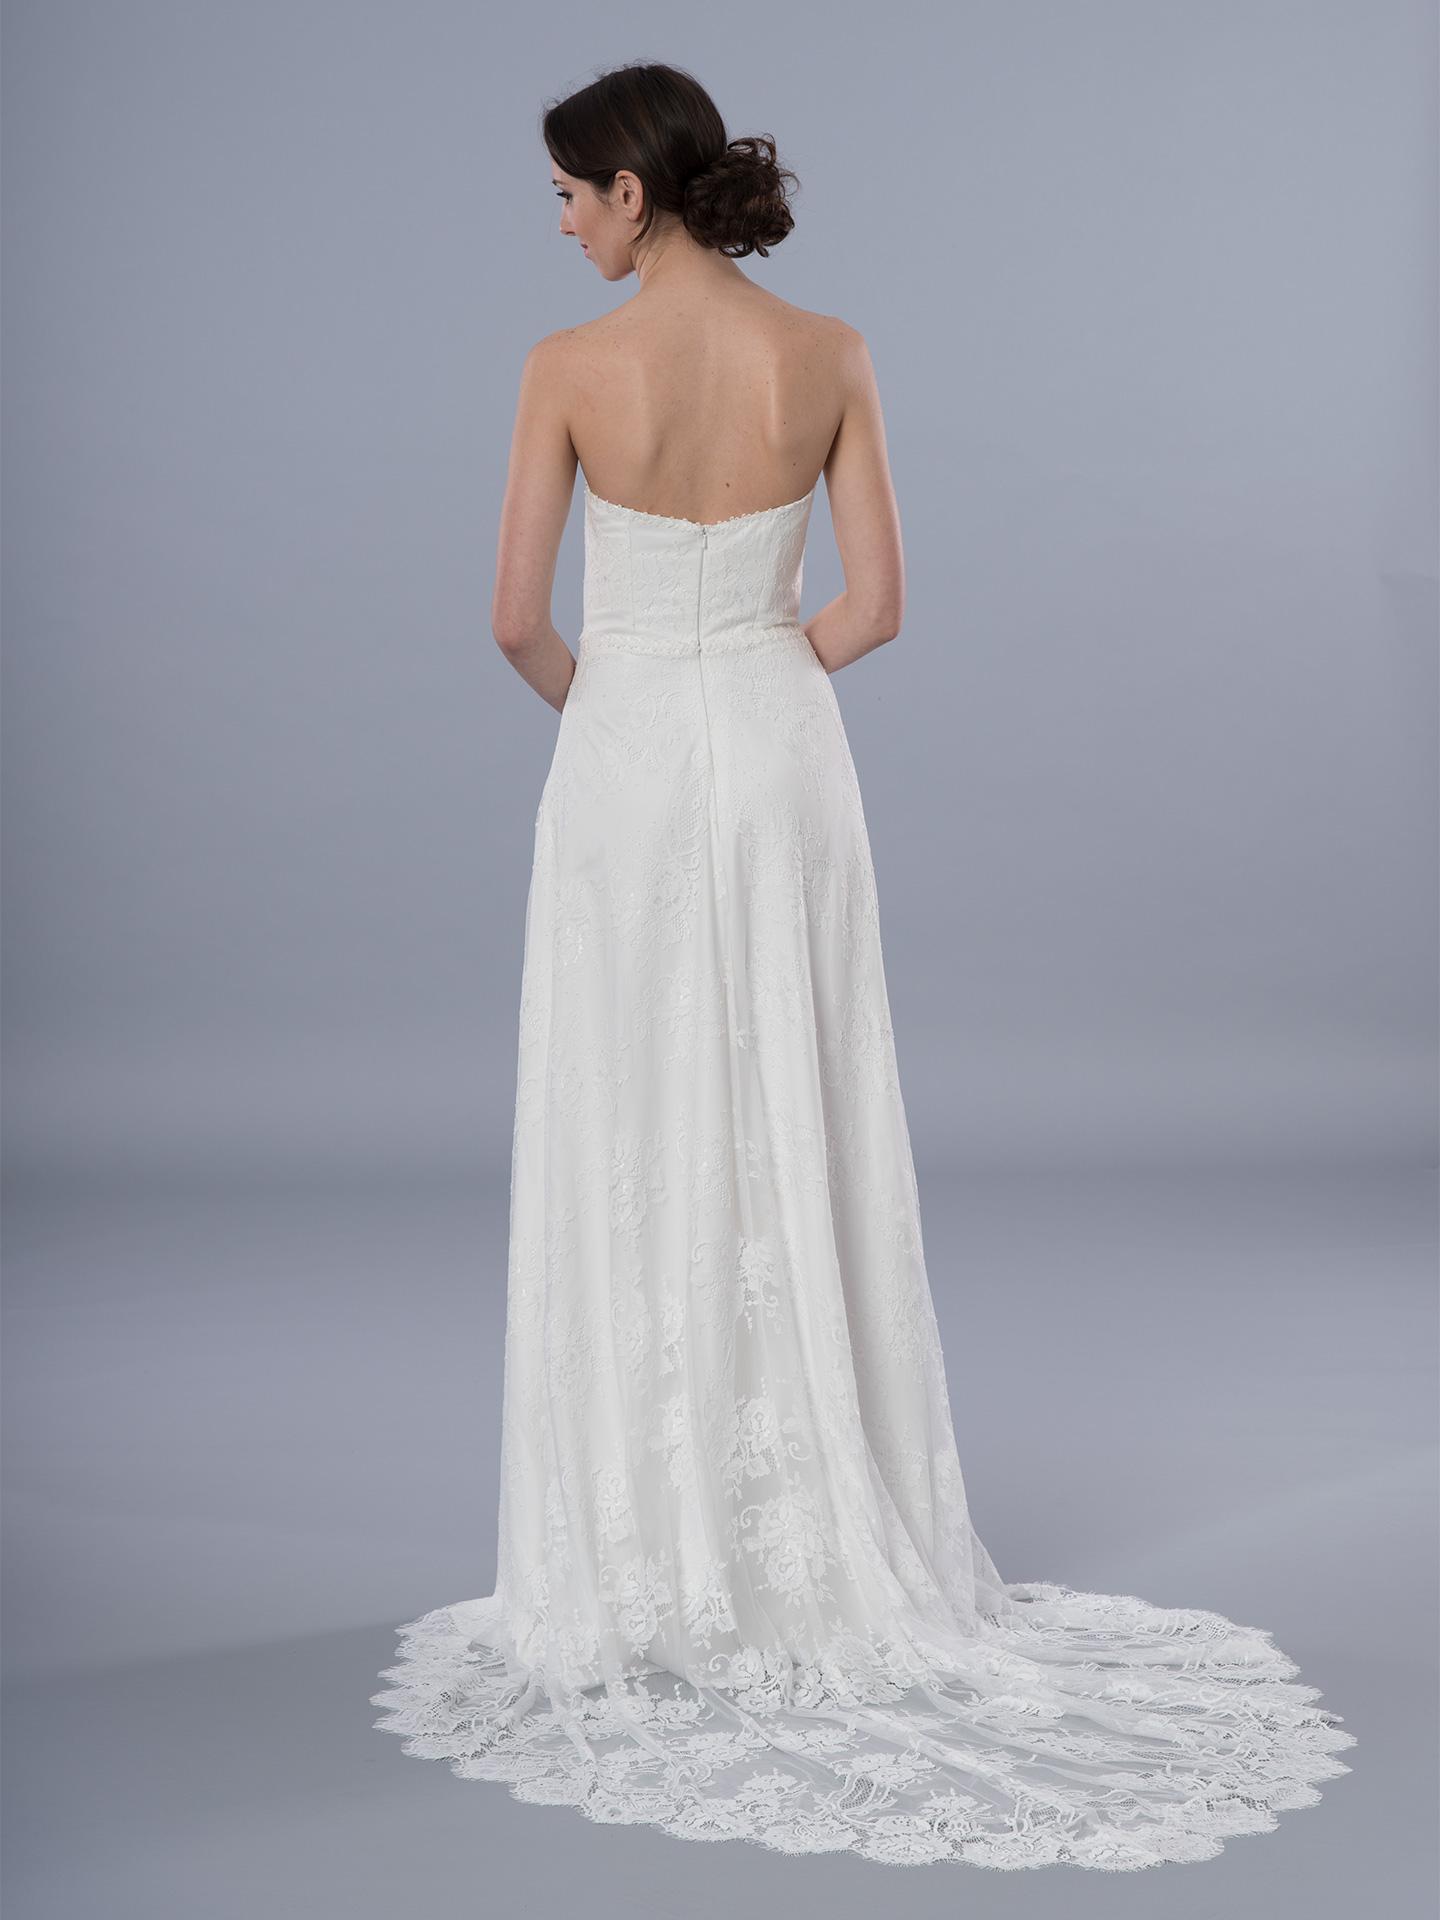 Boho wedding dress strapless 4069